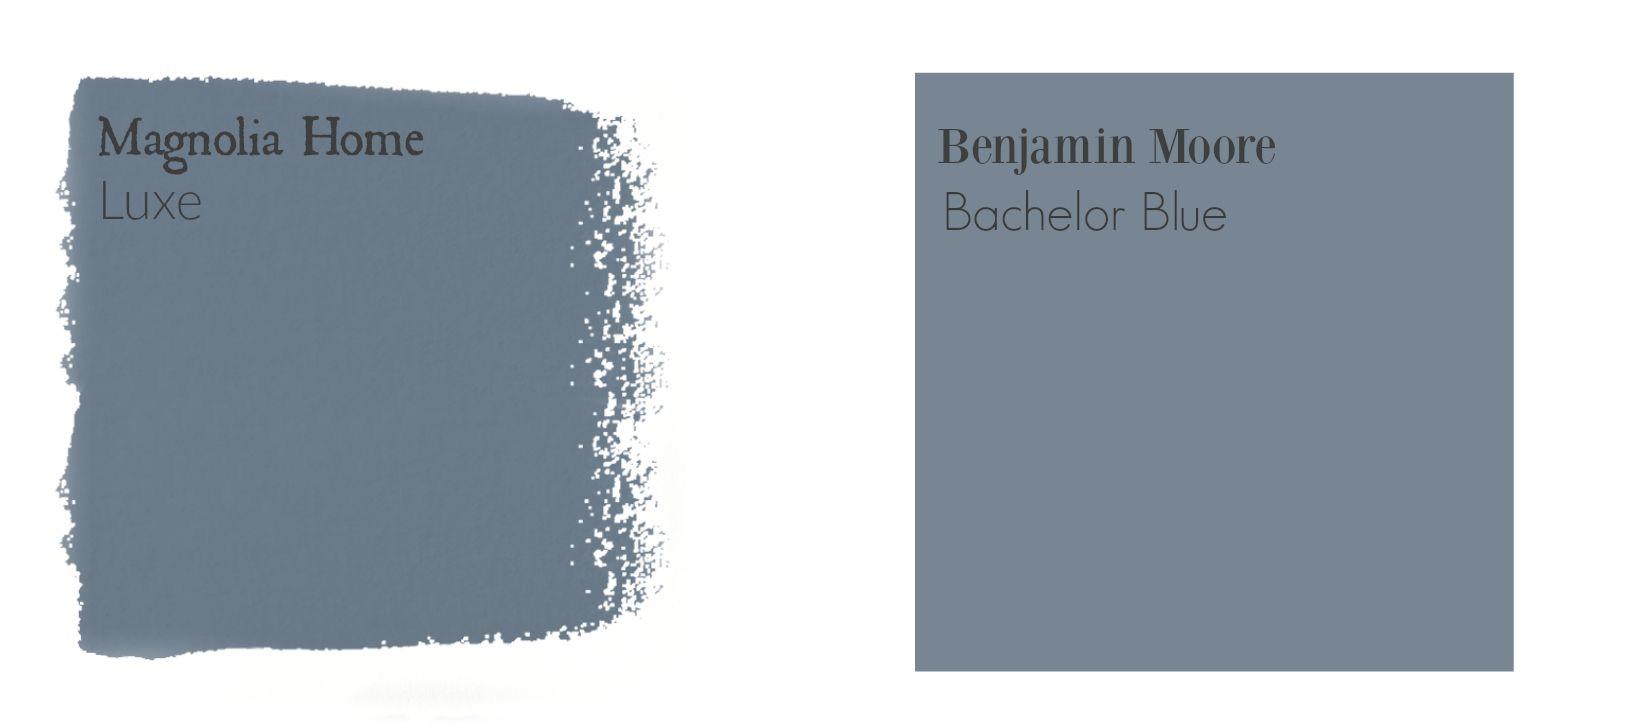 jg luxe color match to bachelor blue bm